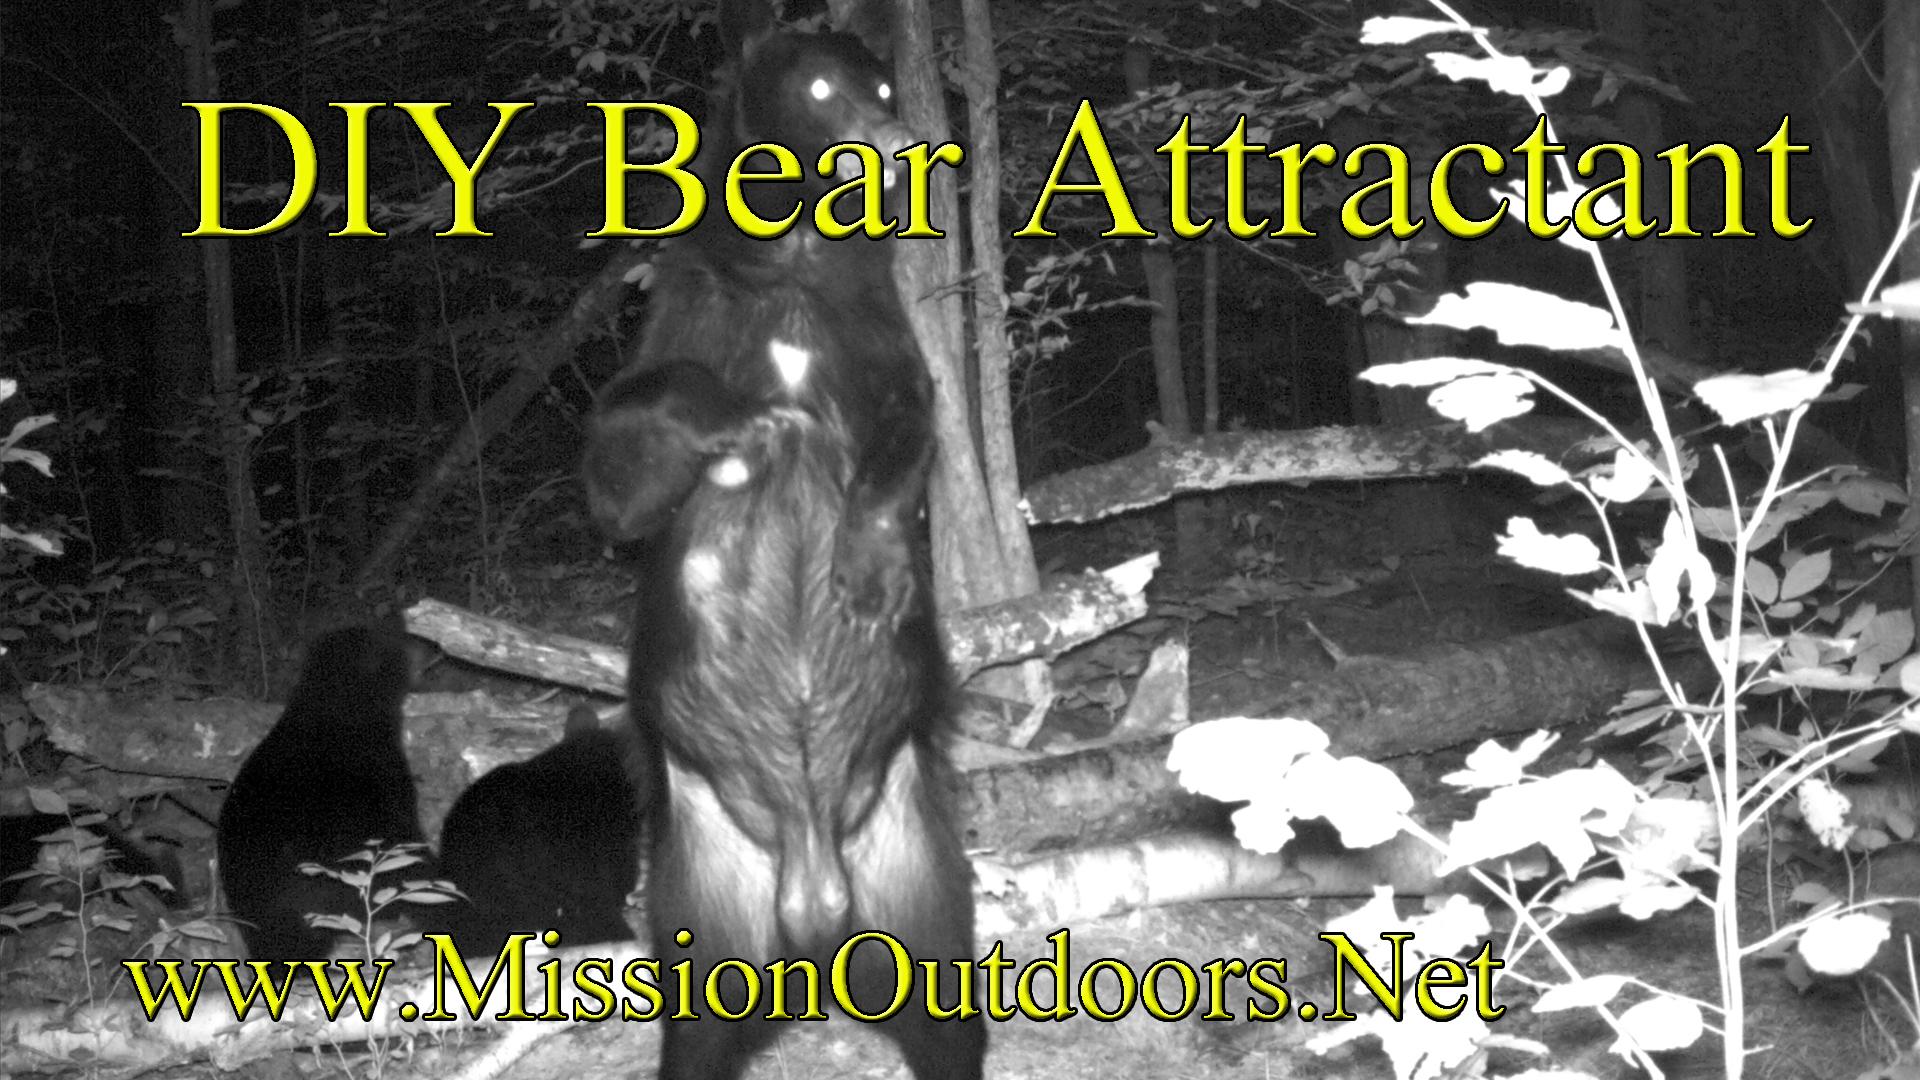 DIY Bear Attractant: MissionOutdoors.Net